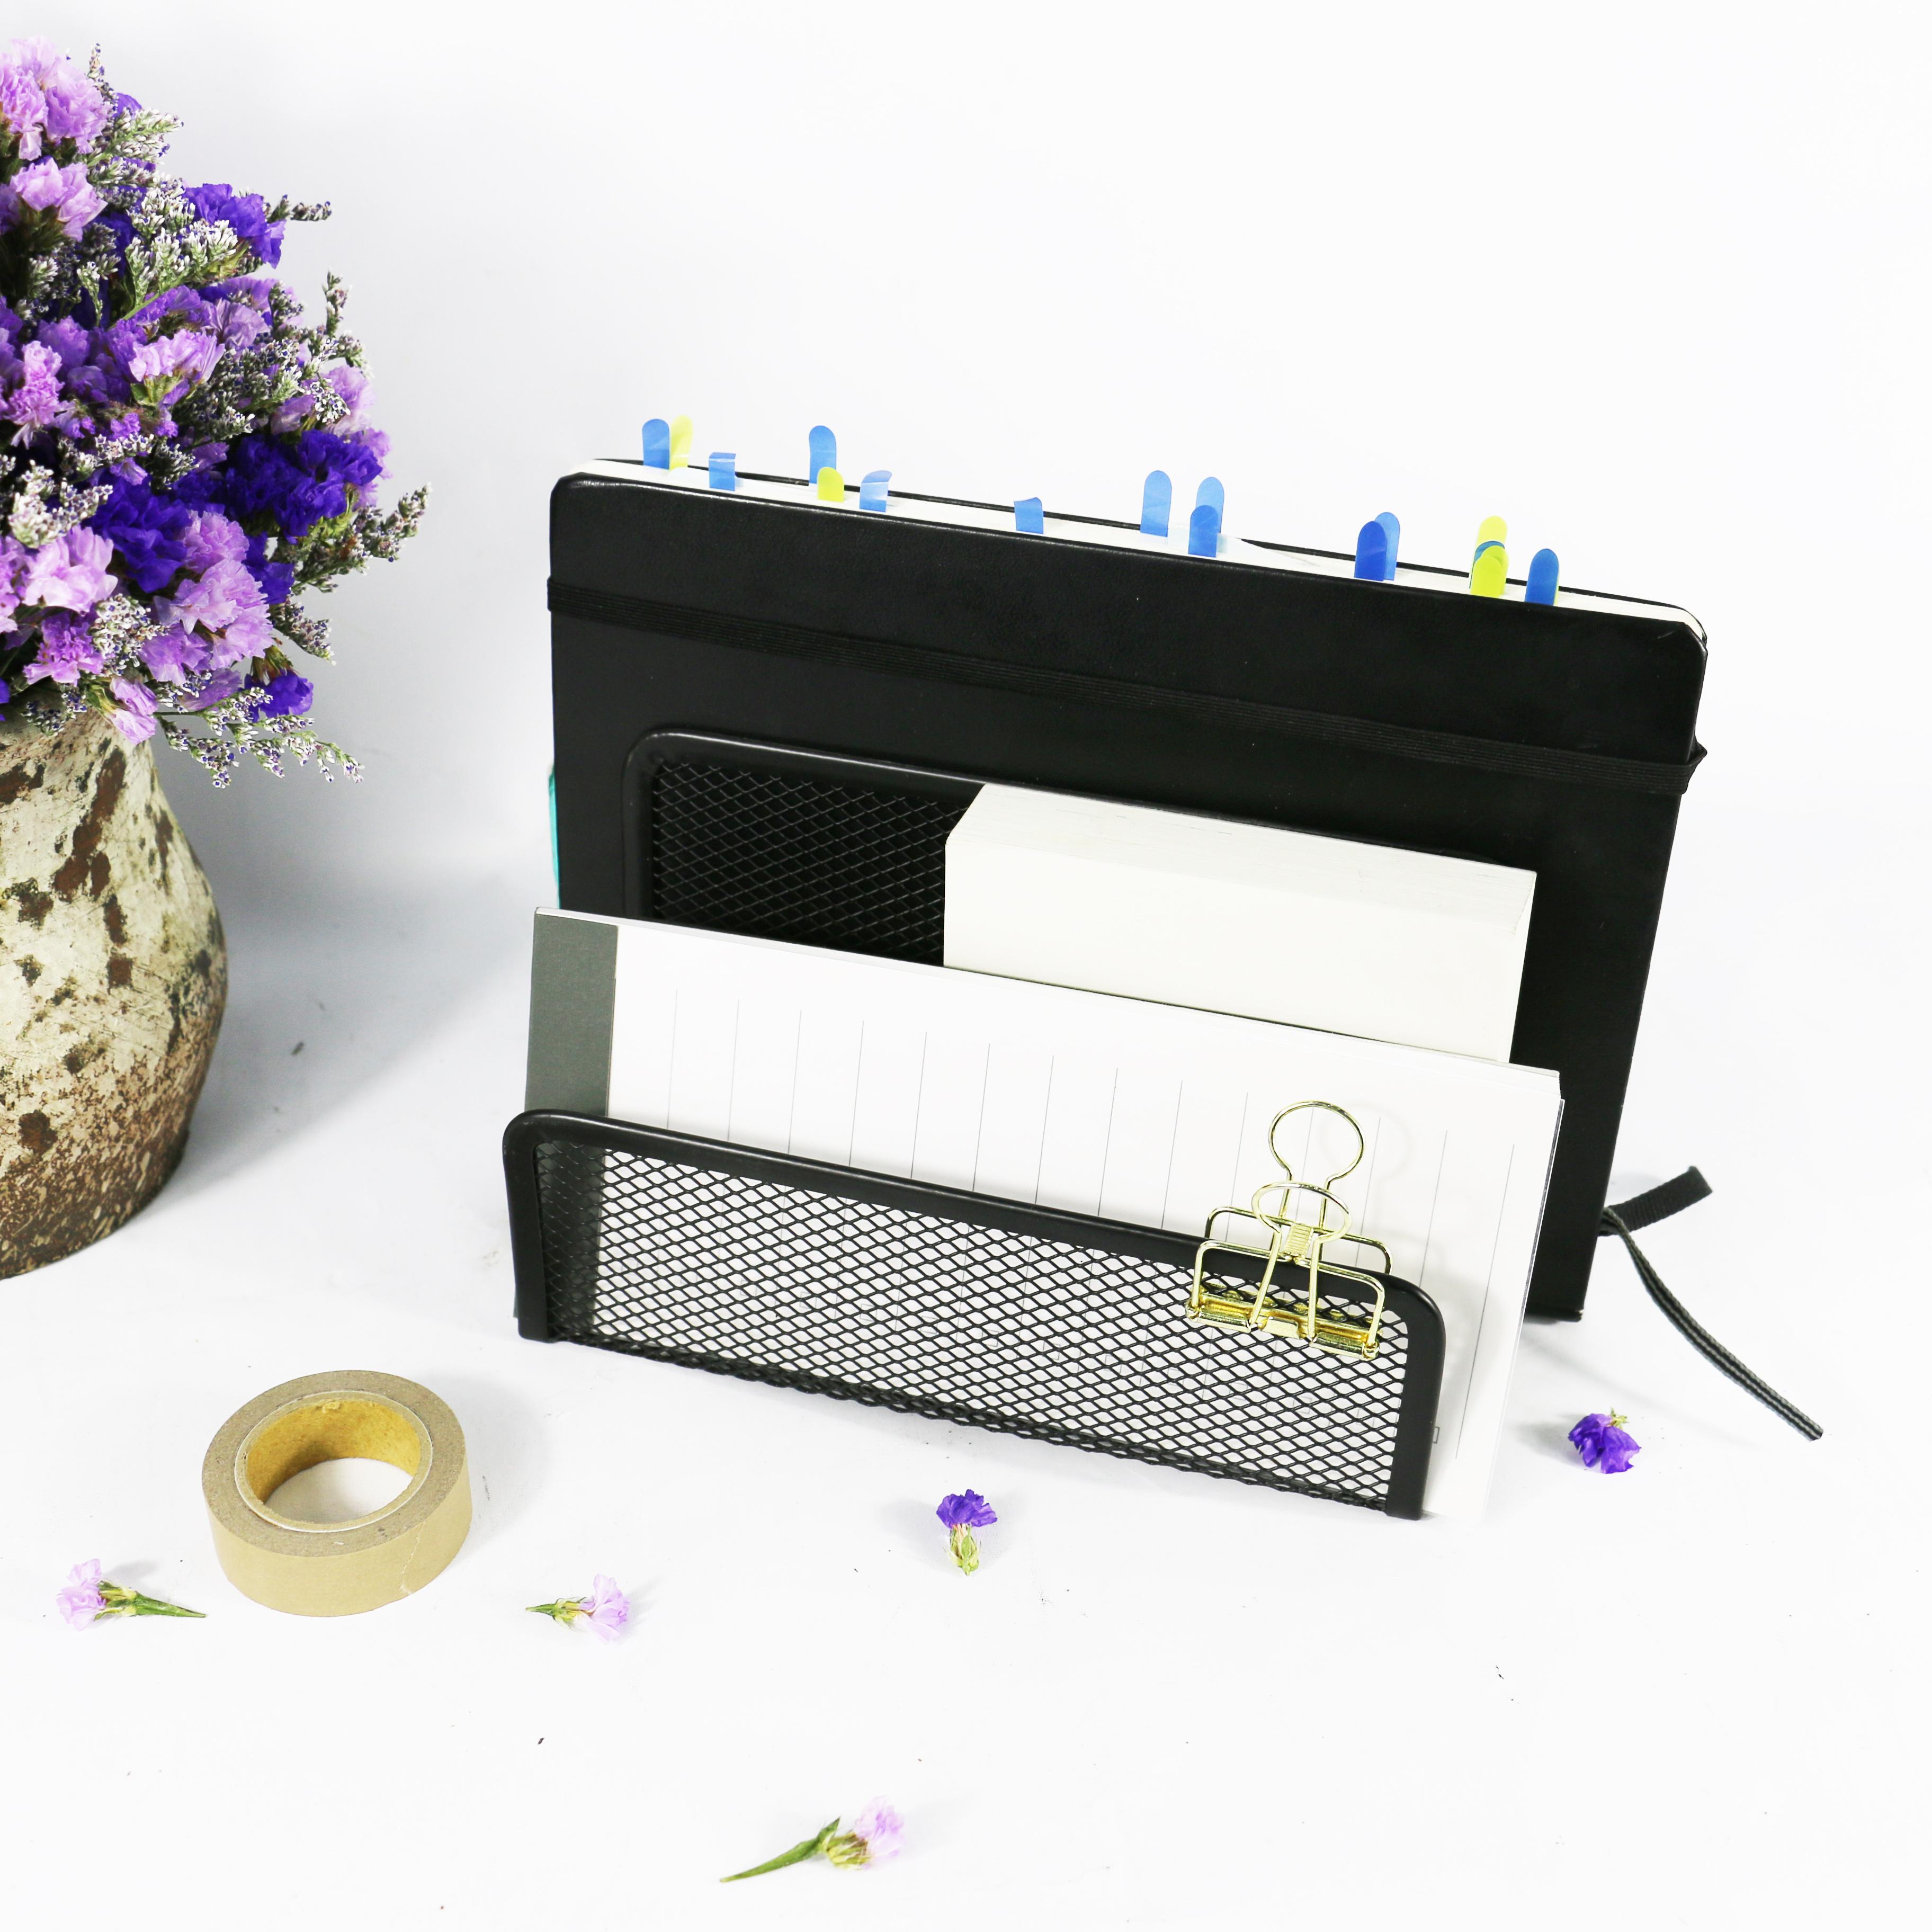 3unit Stationery Products mesh metal letter holder for desk organizer